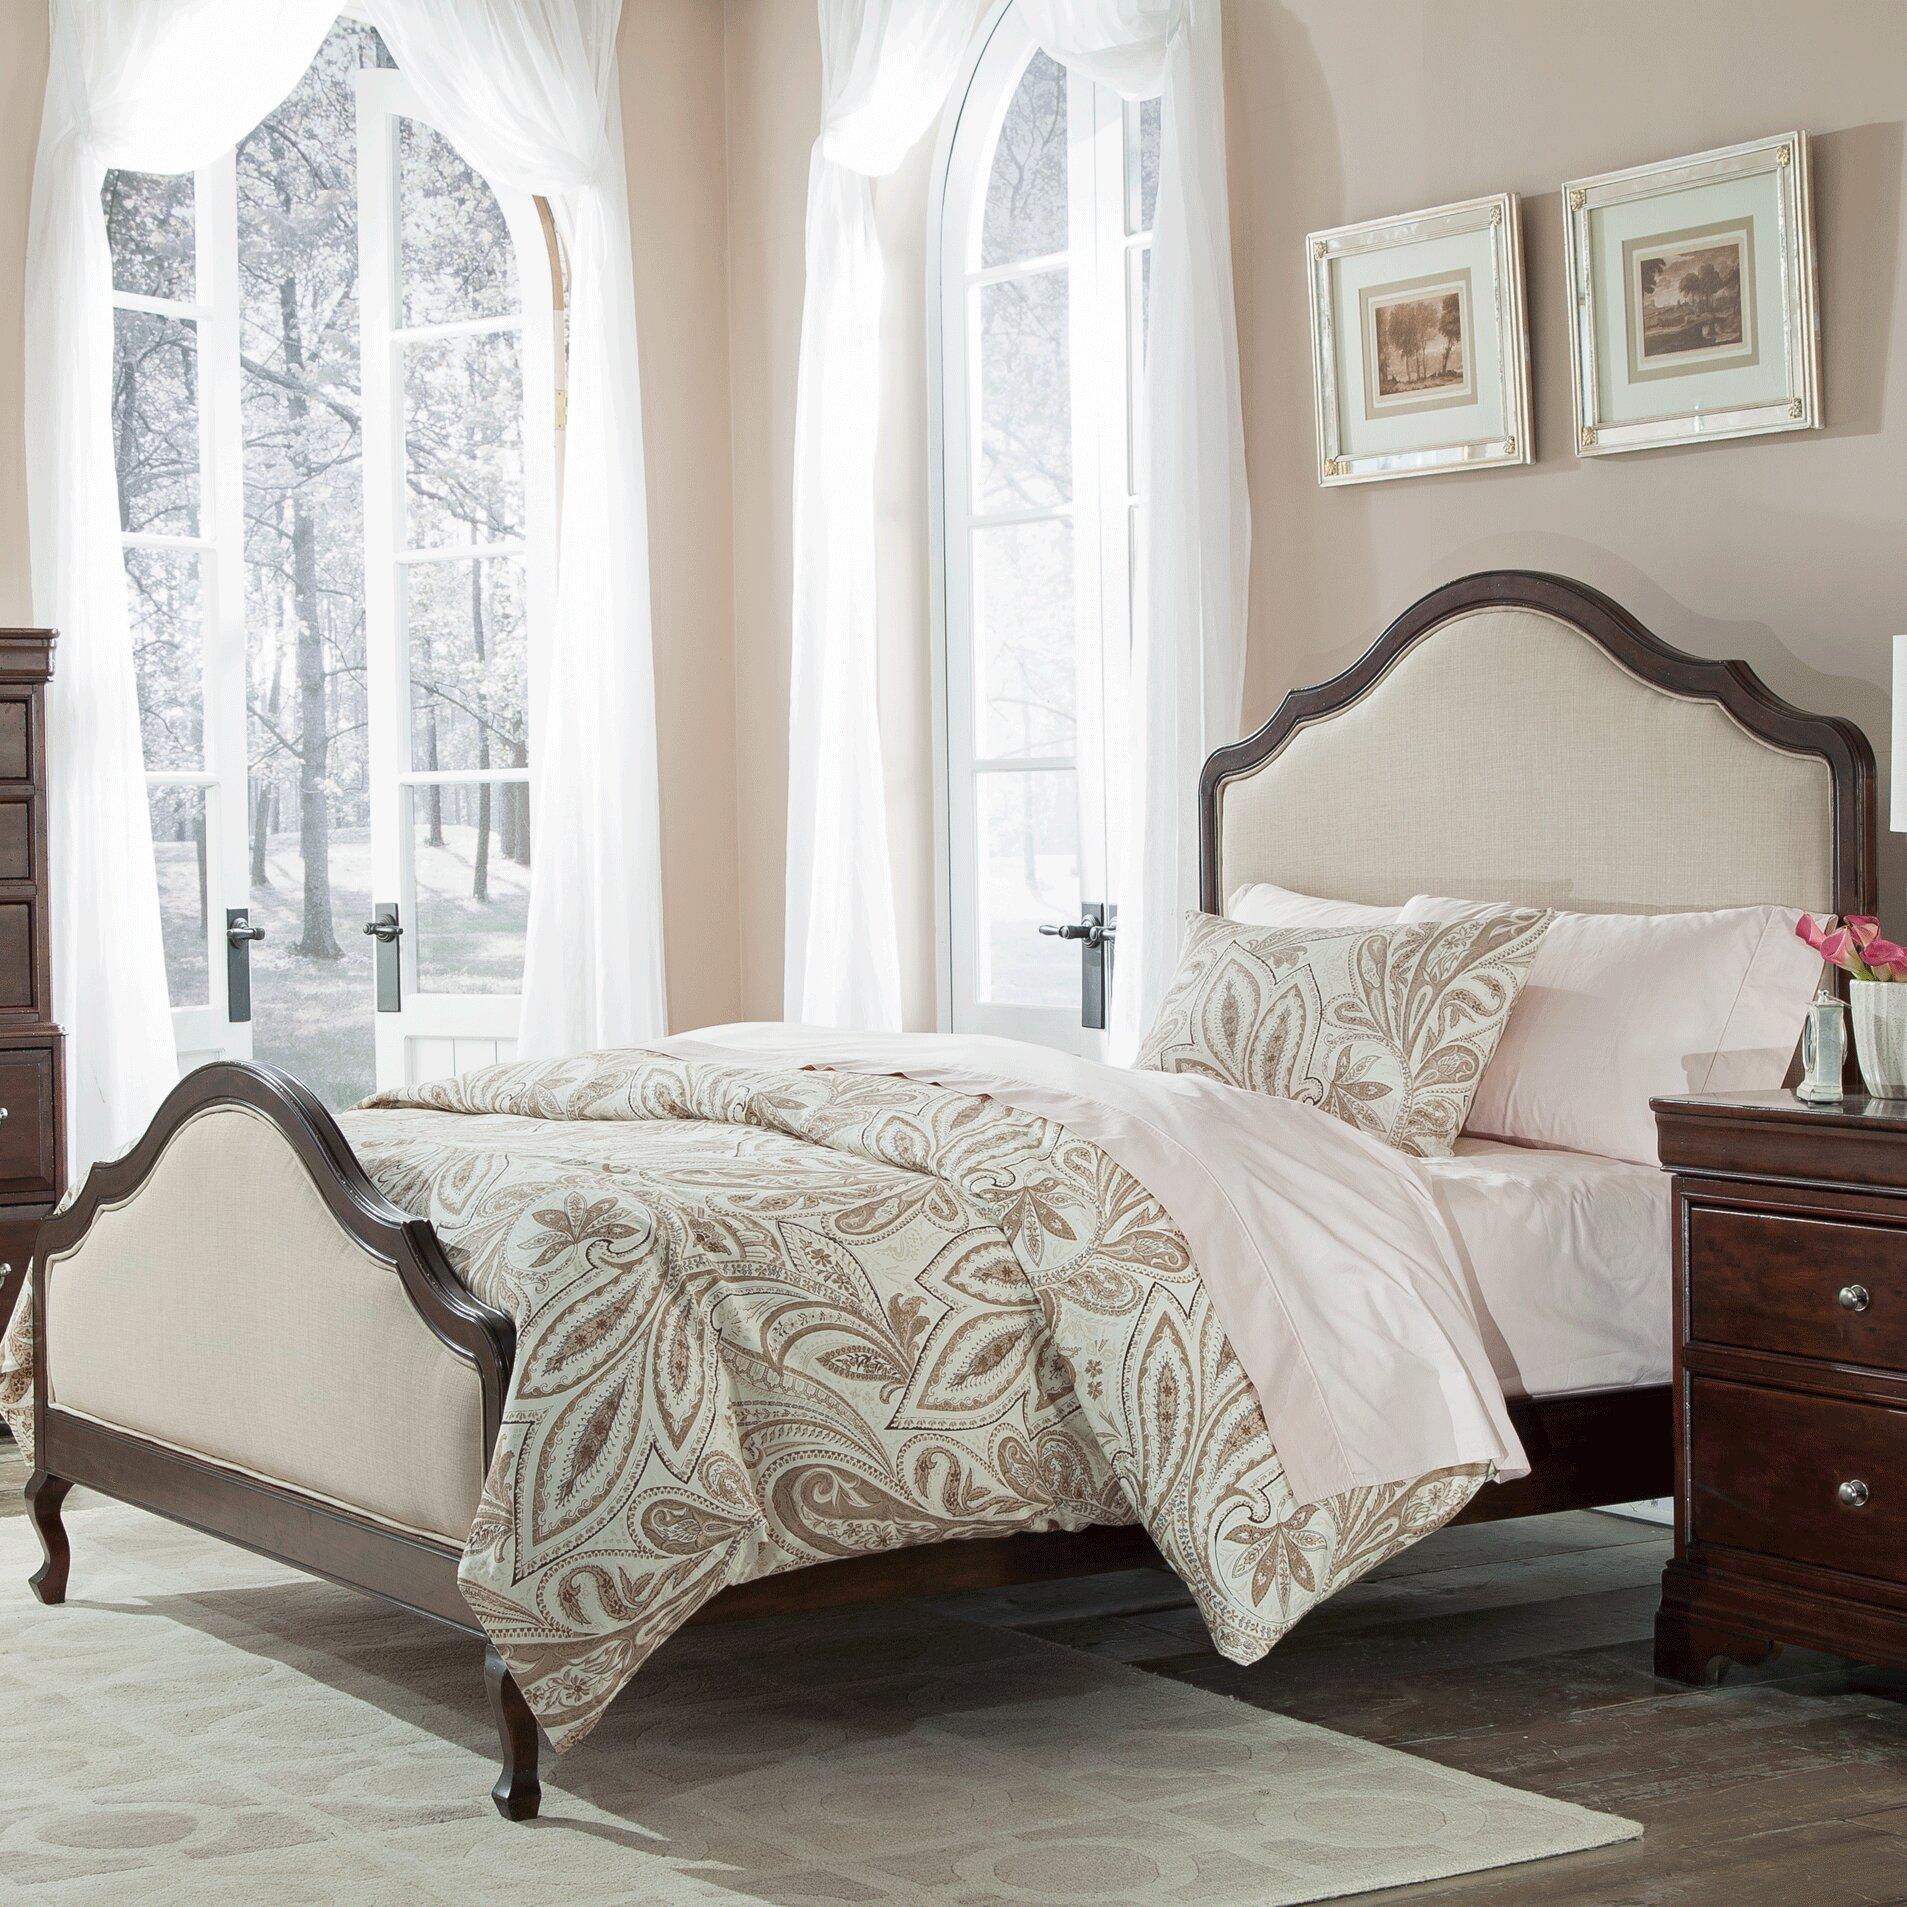 Provence Bedroom Furniture Cresent Furniture Provence Upholstered Panel Bed Reviews Wayfair